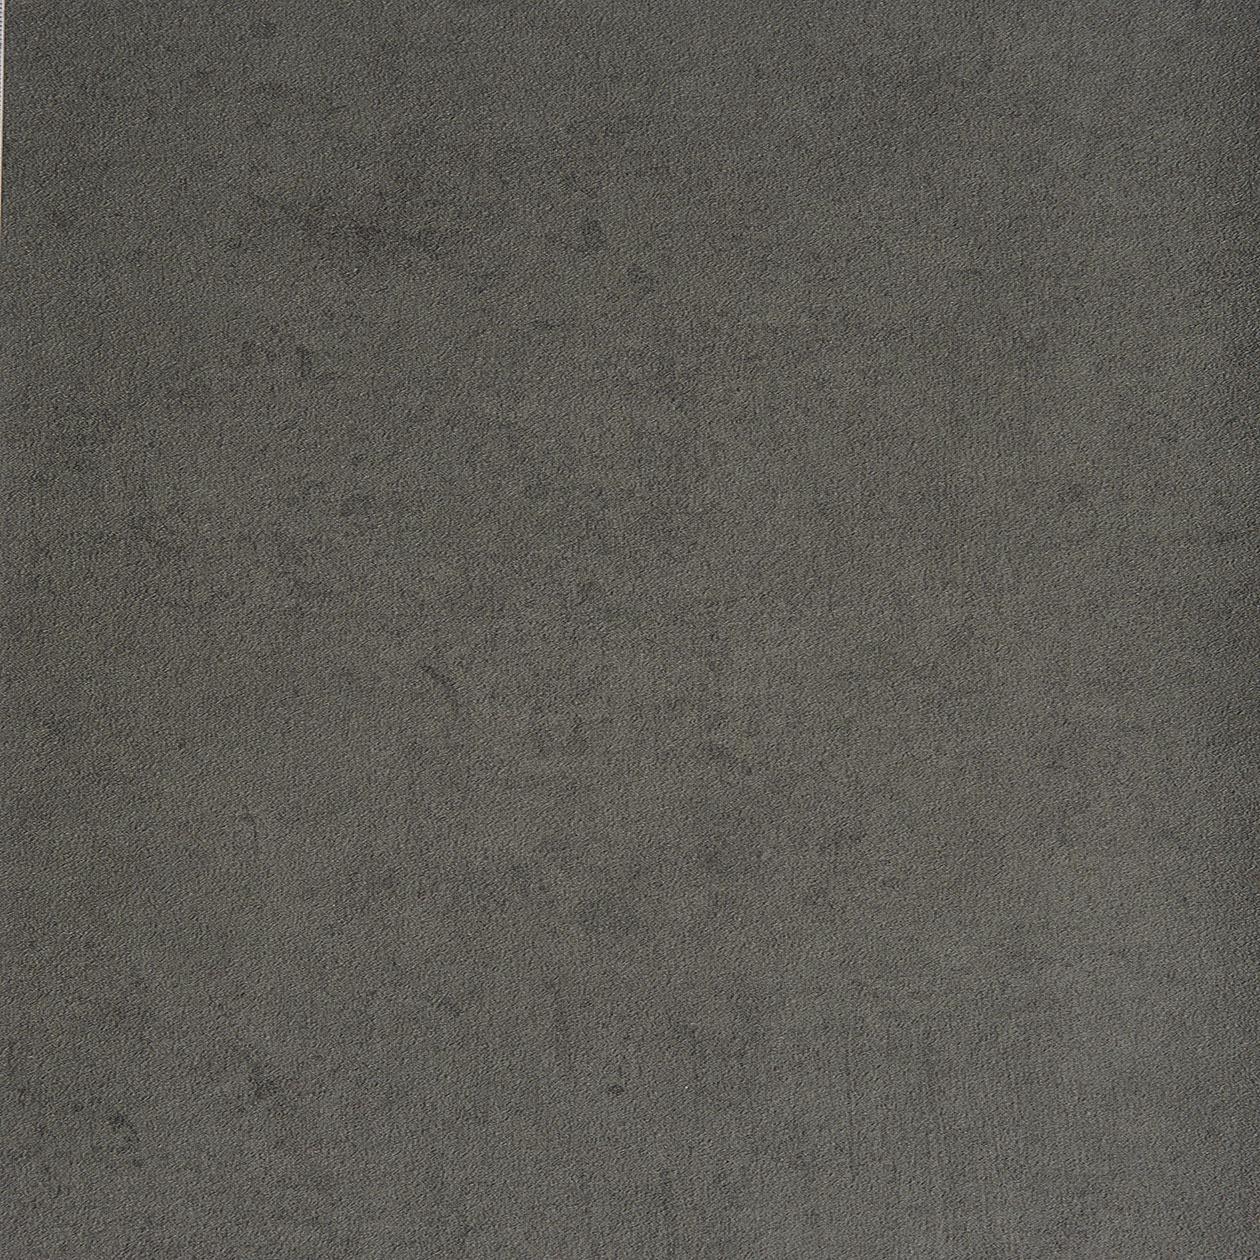 Французские обои Texdecor,  коллекция Element, артикул90421094